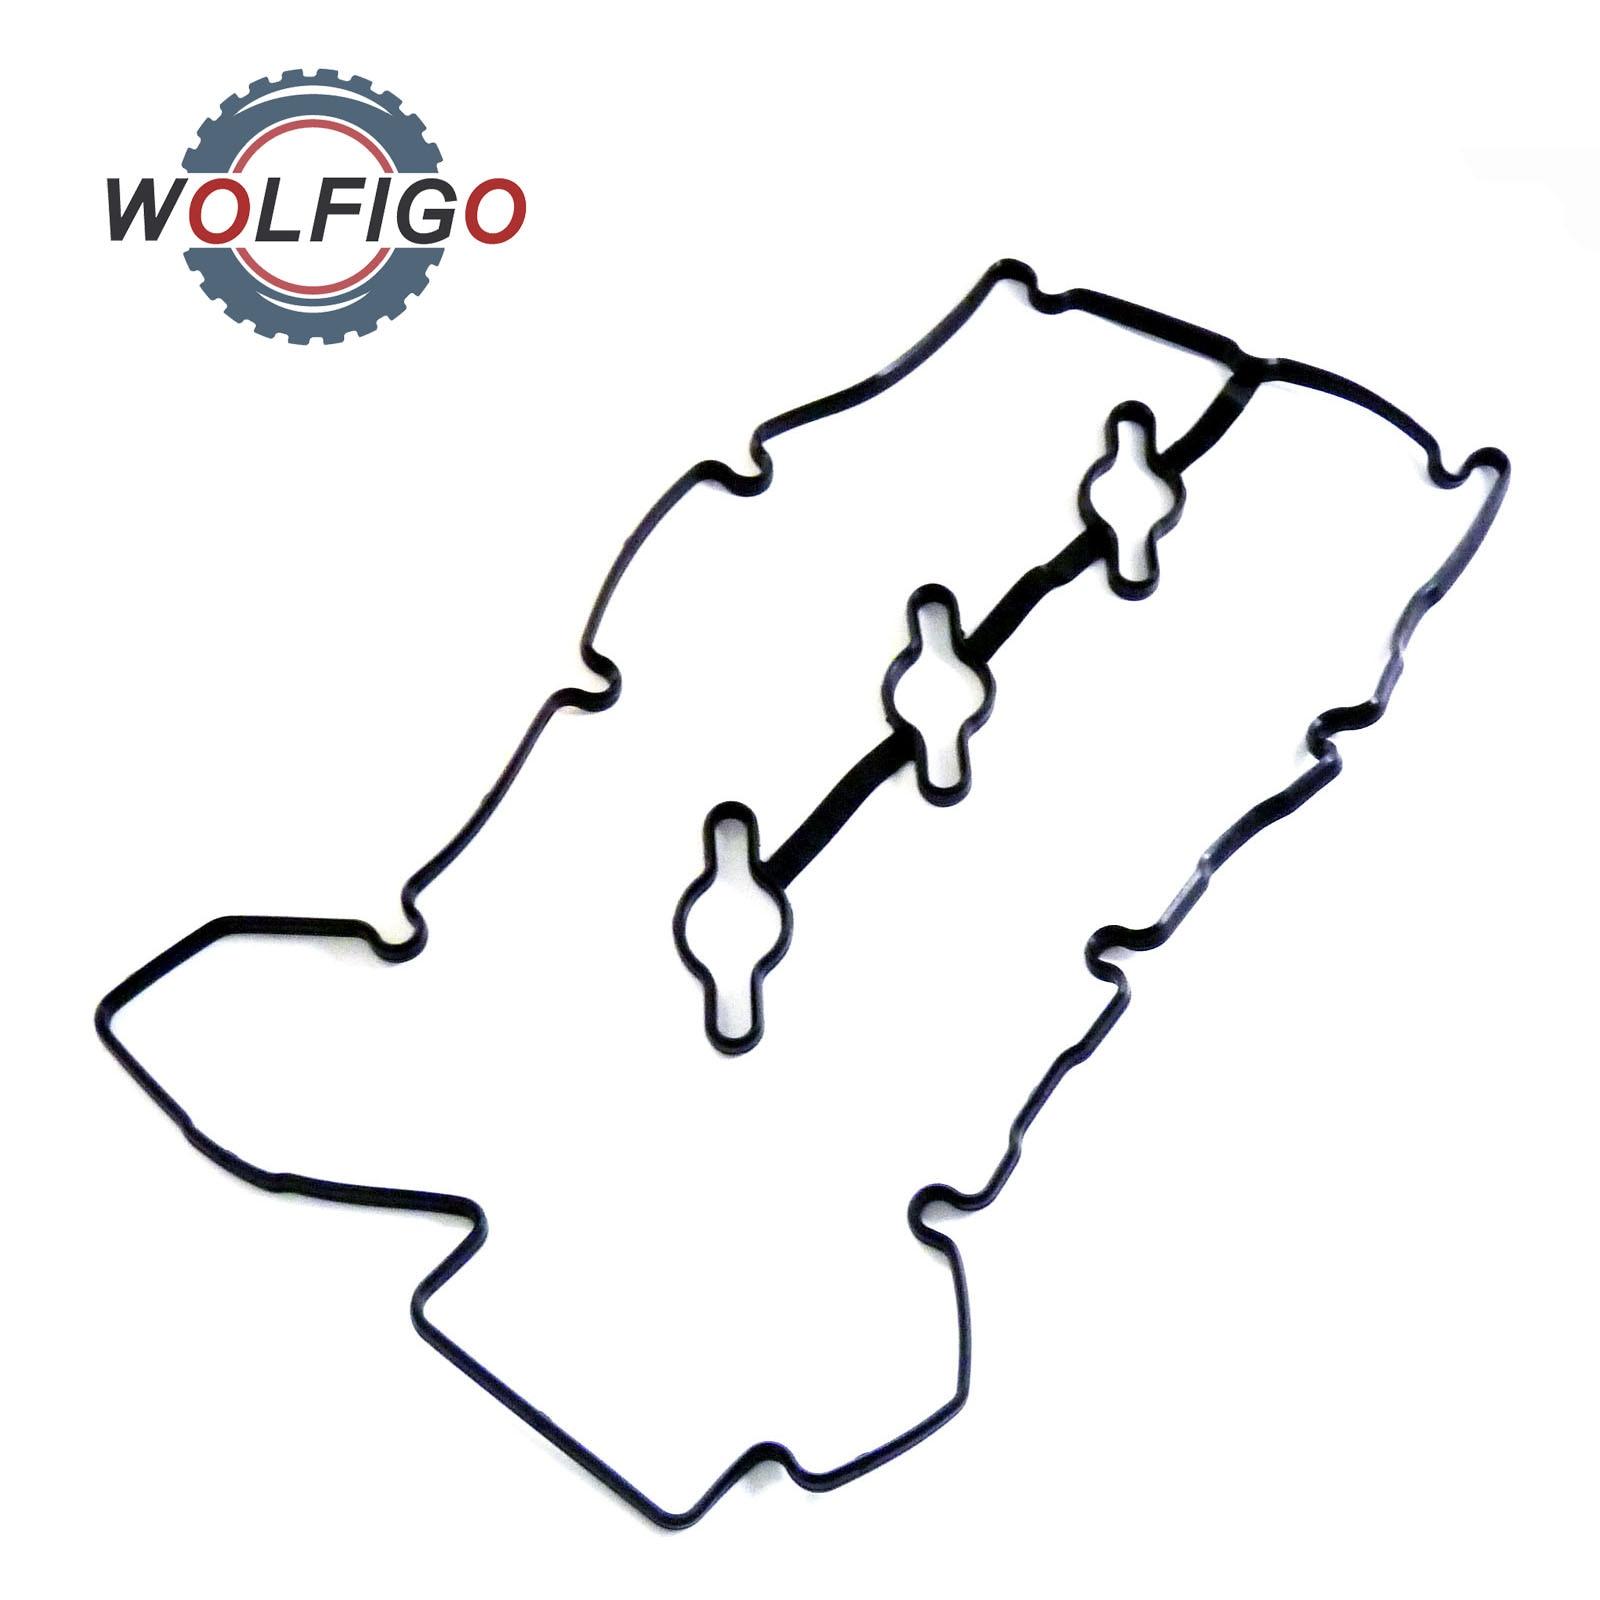 medium resolution of wolfigo right engine valve cover gasket 22441 3c110 vs50750r for hyundai azera kia sorento new